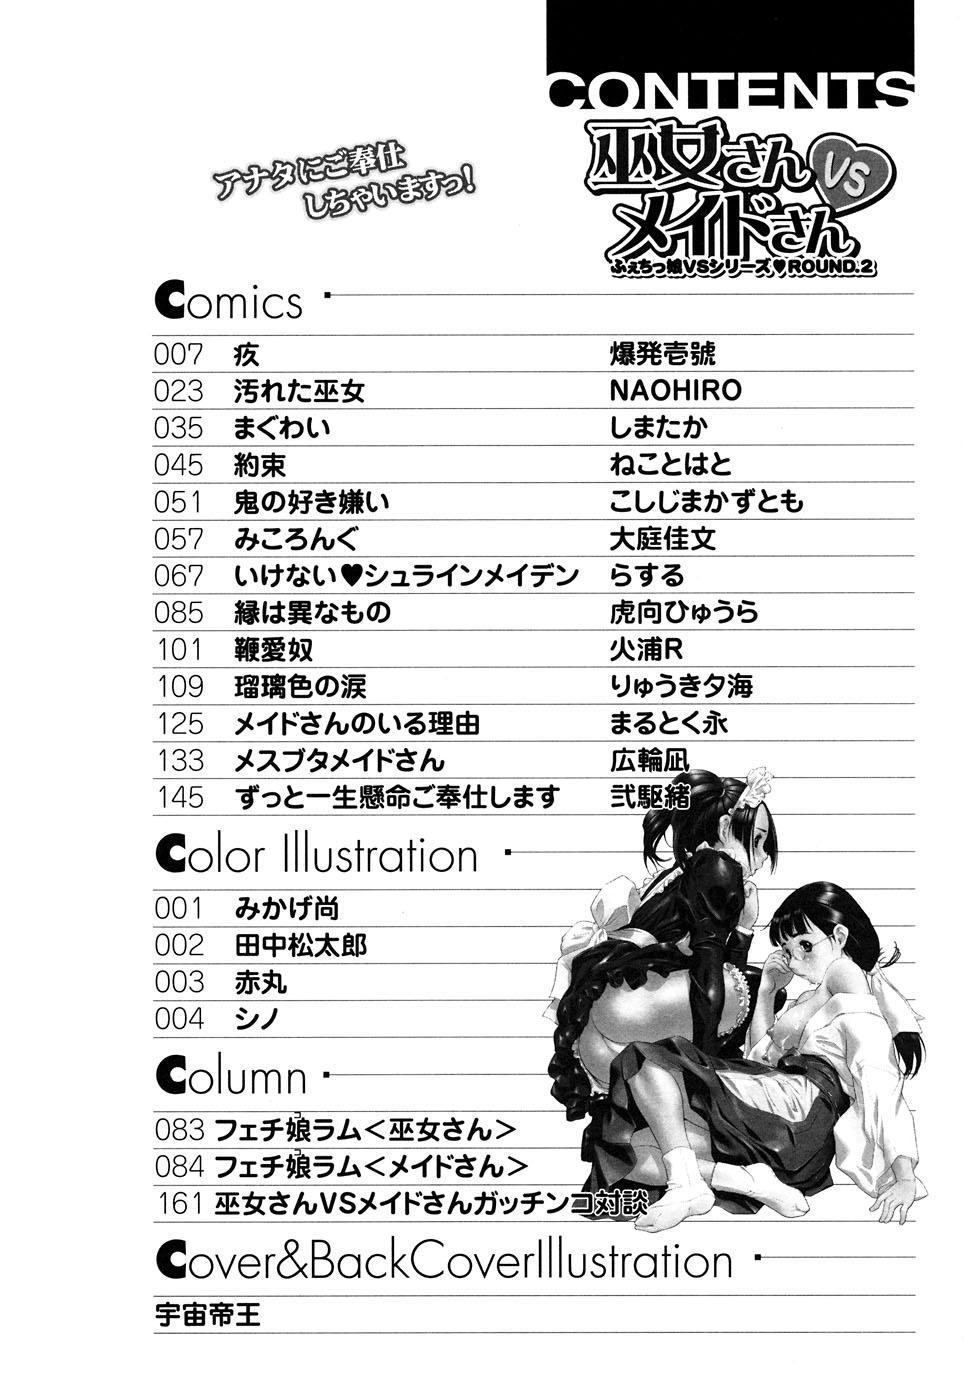 Fechikko VS Series ROUND.2 Miko San VS Maid San 8